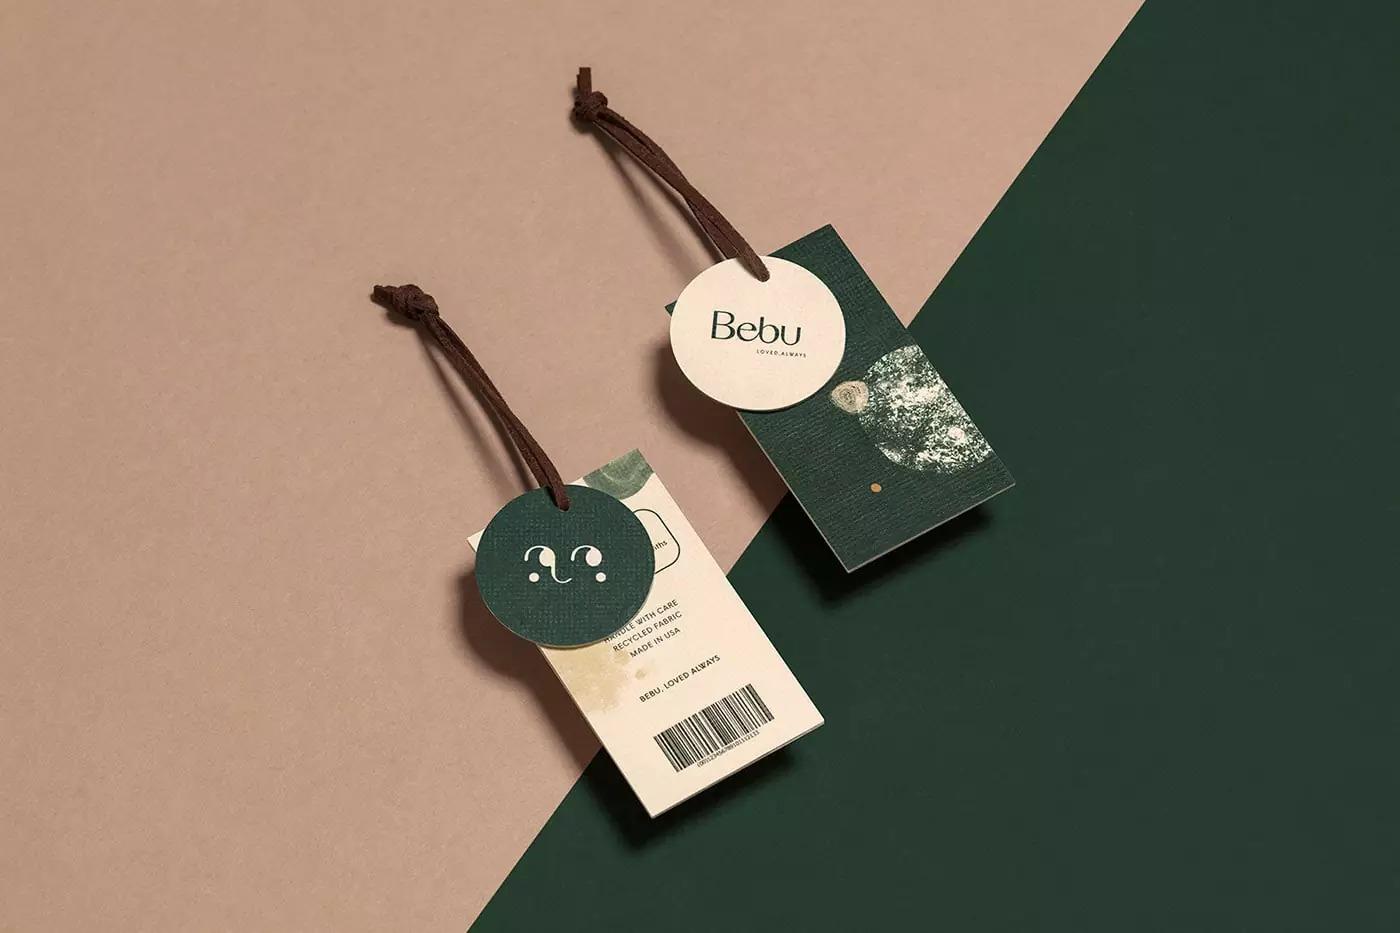 Bebu儿童服装品牌<a href=http://www.ccdol.com/sheji/pinpai/ target=_blank class=infotextkey>VI设计</a>